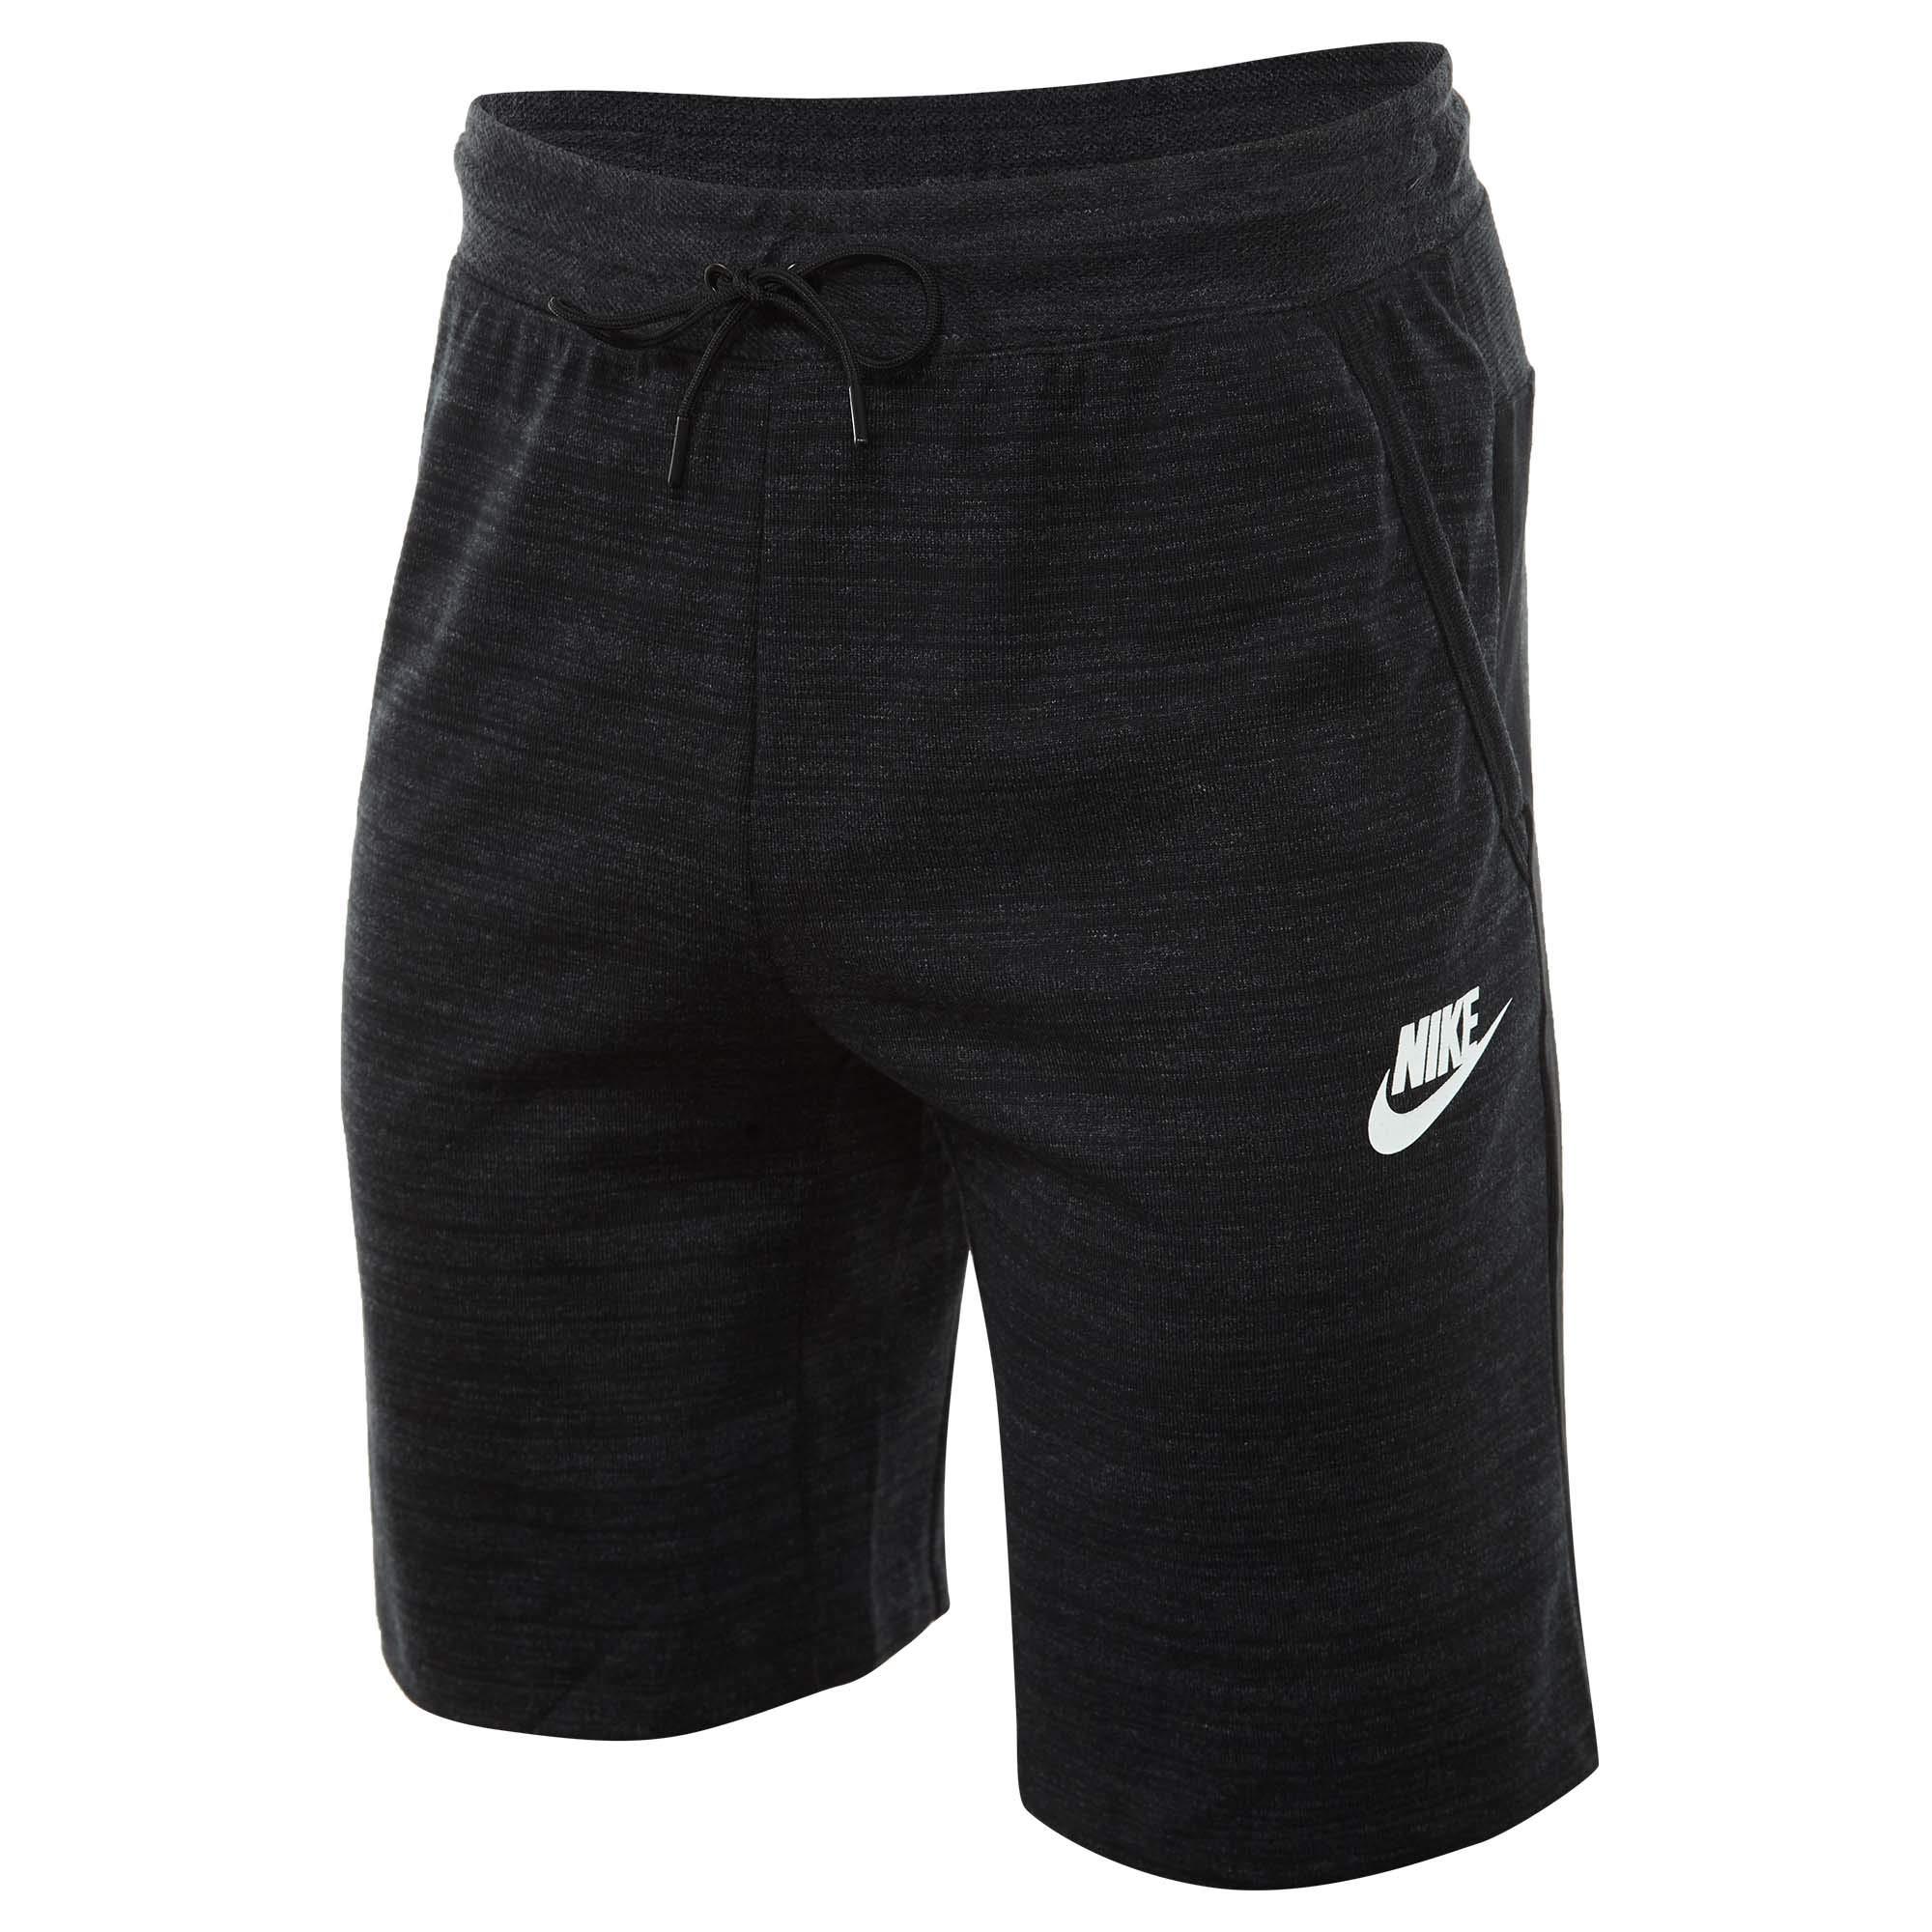 Nike Mens Sportswear Advance 15 Sweat Shorts Black/Heather Black/White 885925-010 Size 2X-Large